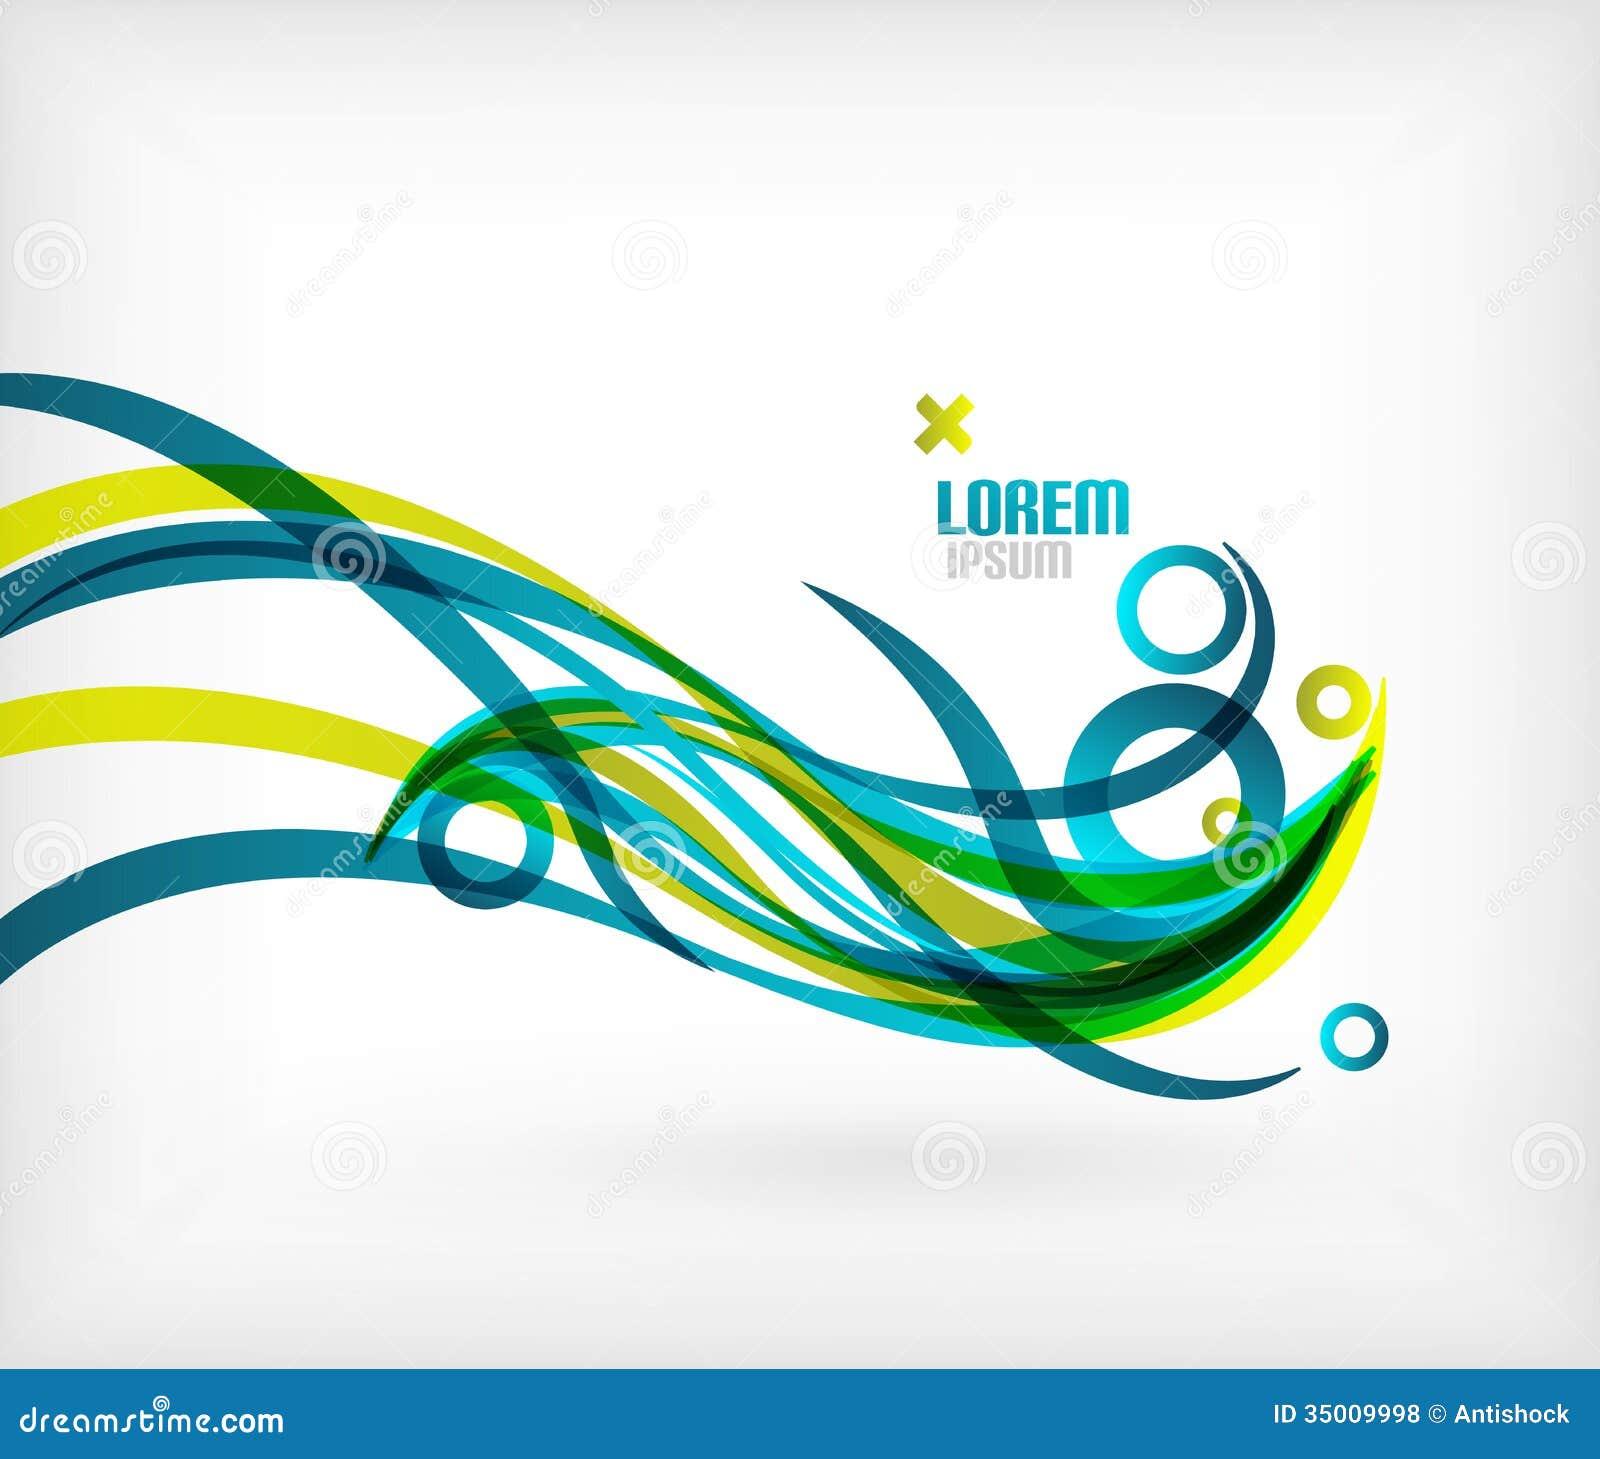 Designer Lines : Blue abstract wave lines minimal design stock vector